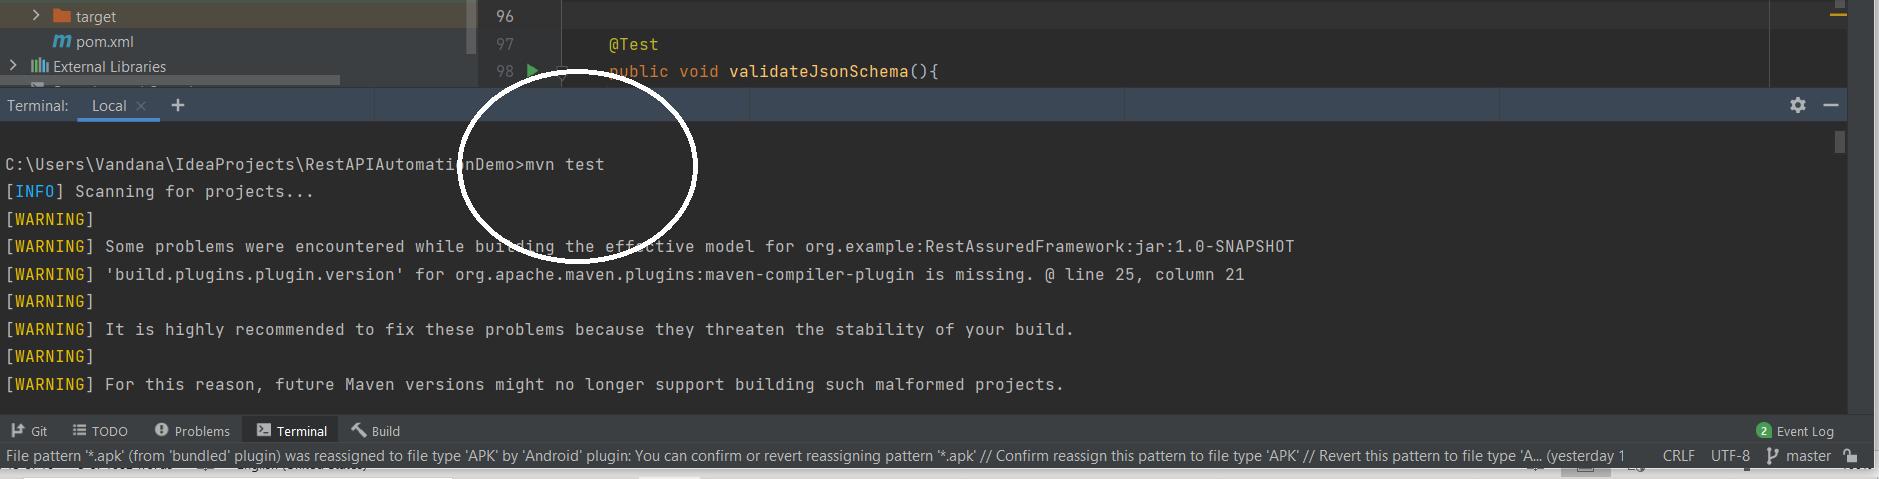 Rest API Automation: Run tests through Maven Commands